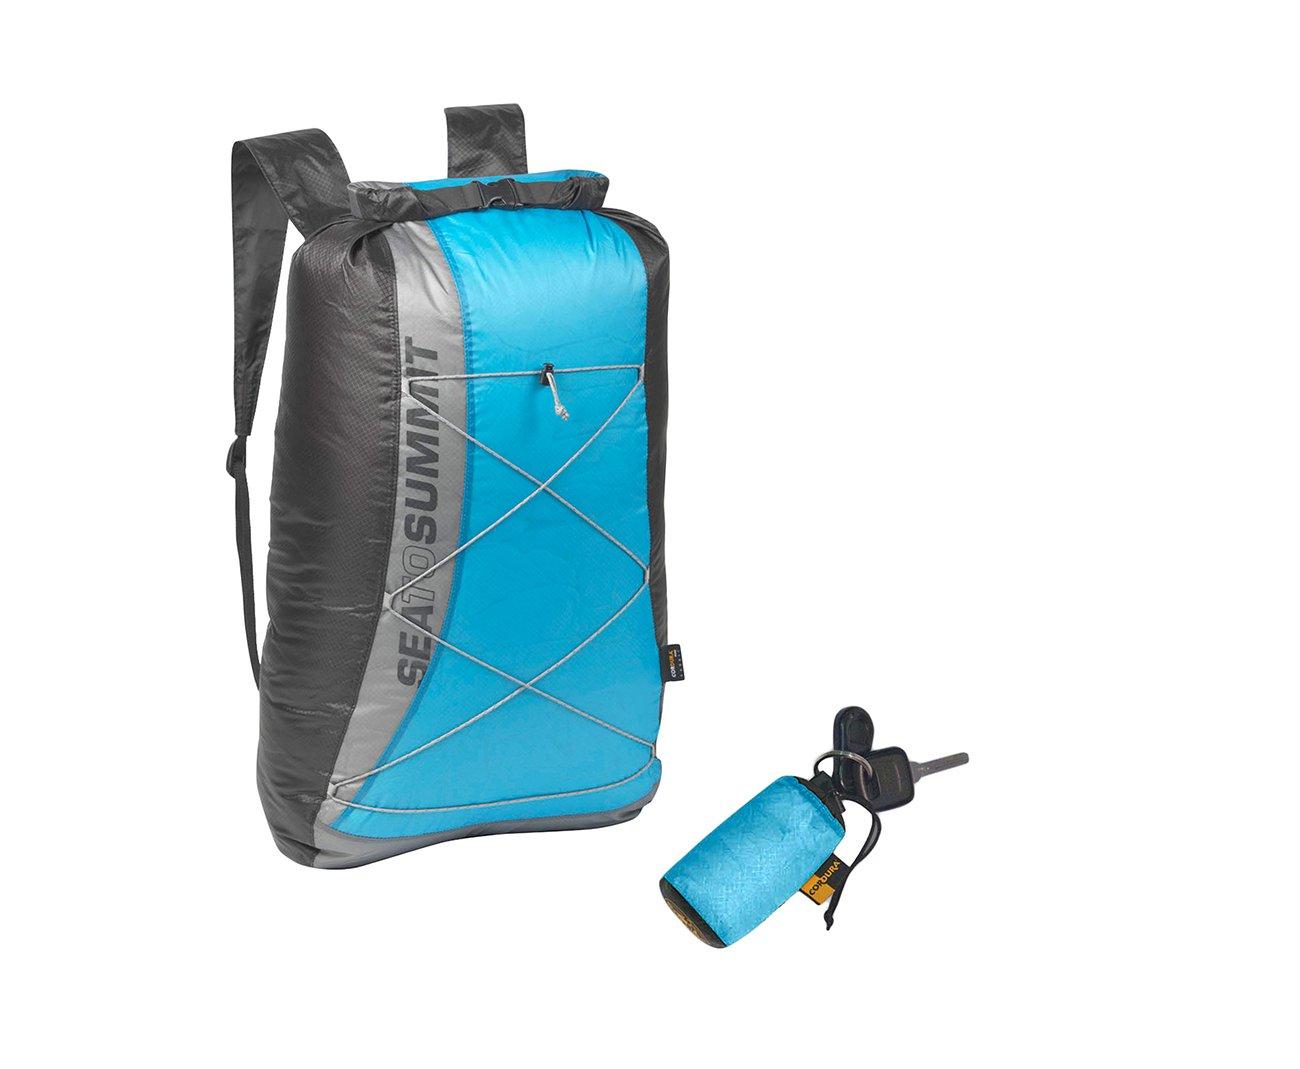 Mochila Sprint Waterproof Drypack 20 Litros Azul - Sea To Summit